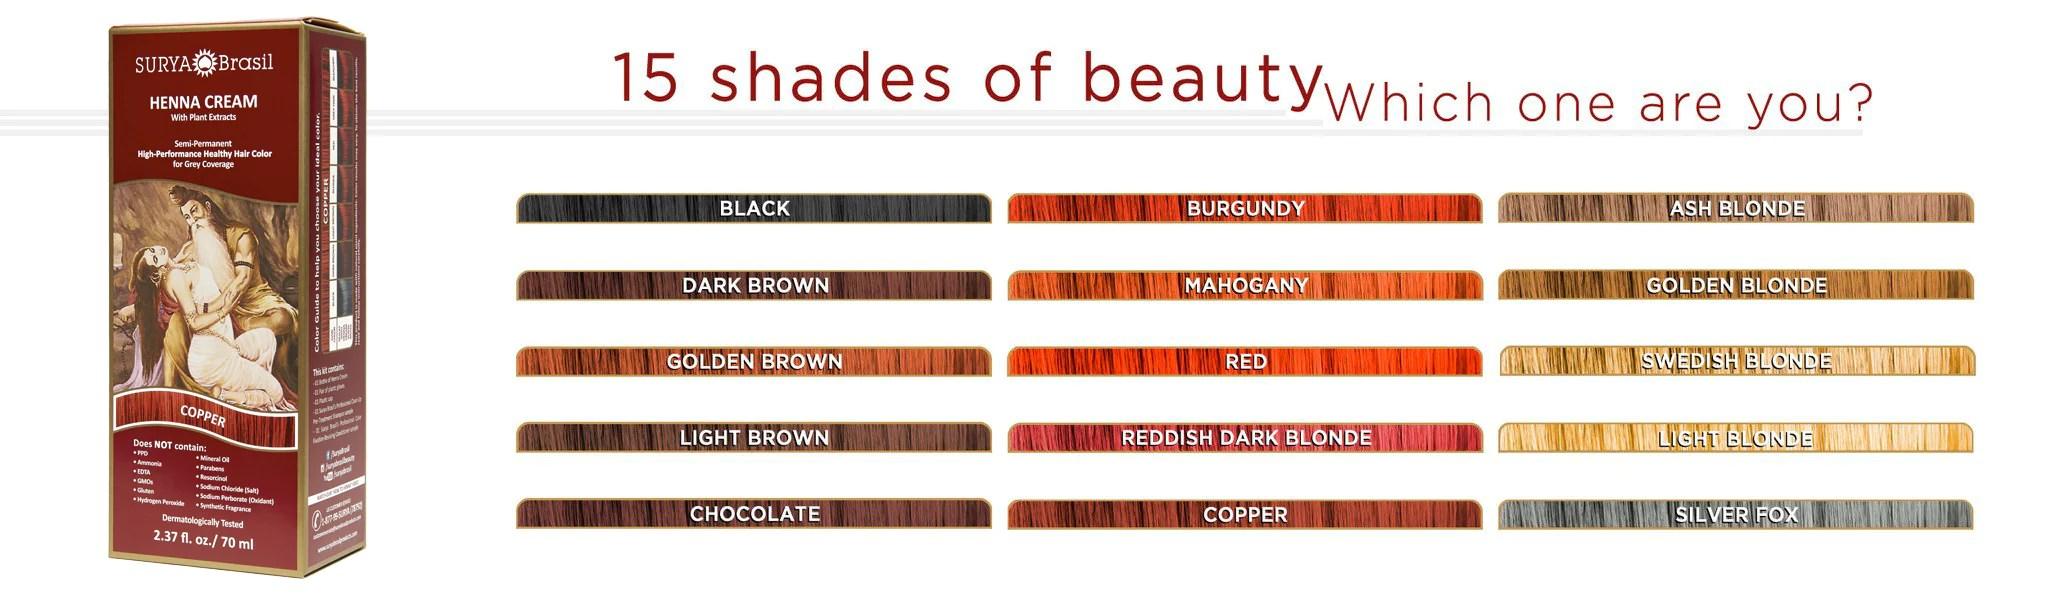 Henna Cream Healthy Hair Color Surya Brasil Surya Brasil